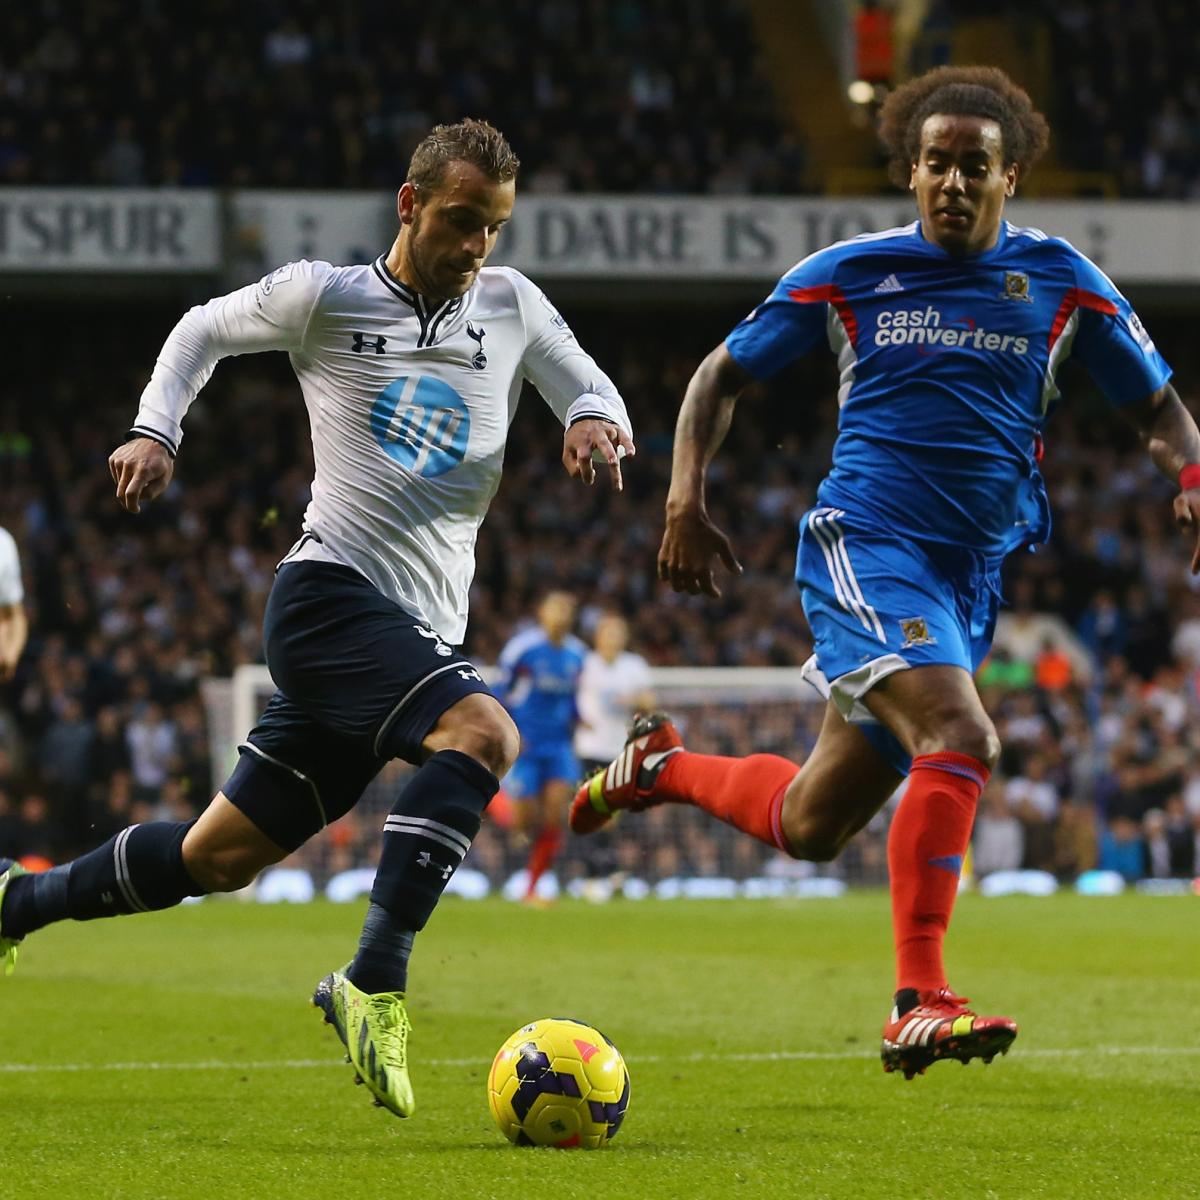 Ajax Vs Tottenham Hotspur Preview Live Stream Tv Info: Tottenham Vs. Hull City: Date, Time, Live Stream, TV Info